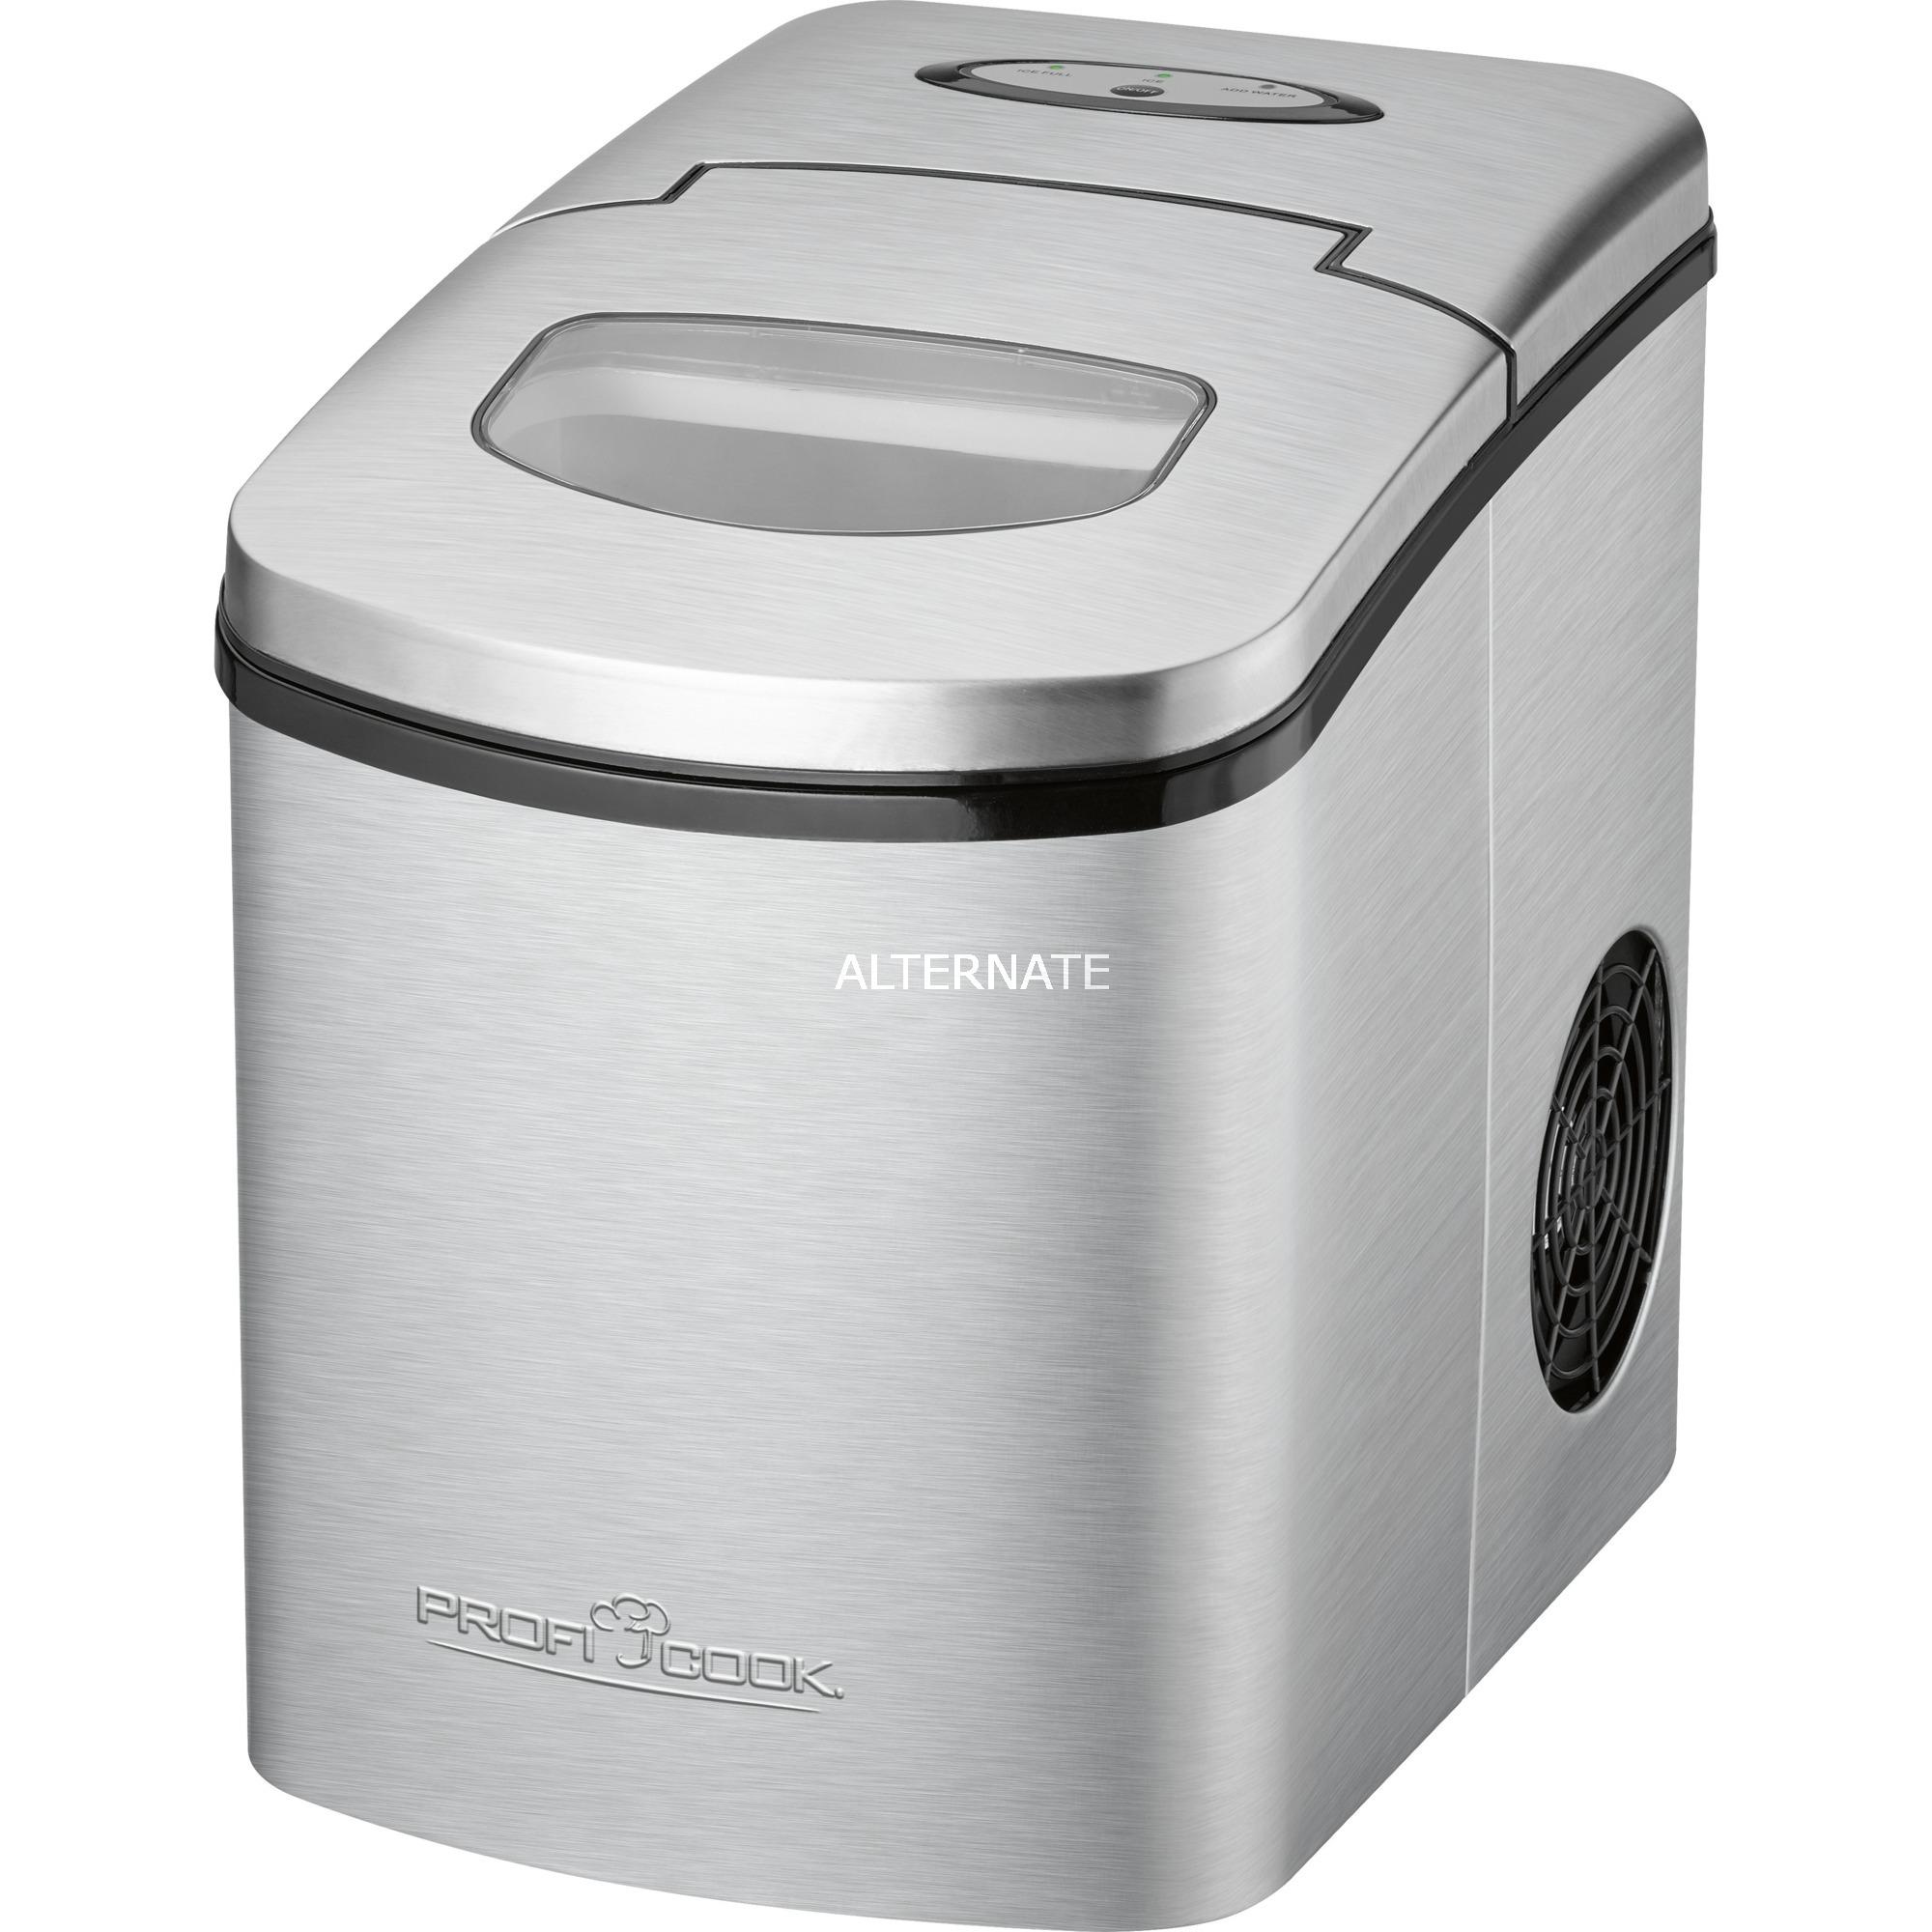 PC-EWB 1079 15kg/24h 150W Plata, Negro máquina de cubo de hielo, Preparador de cubitos de hielo